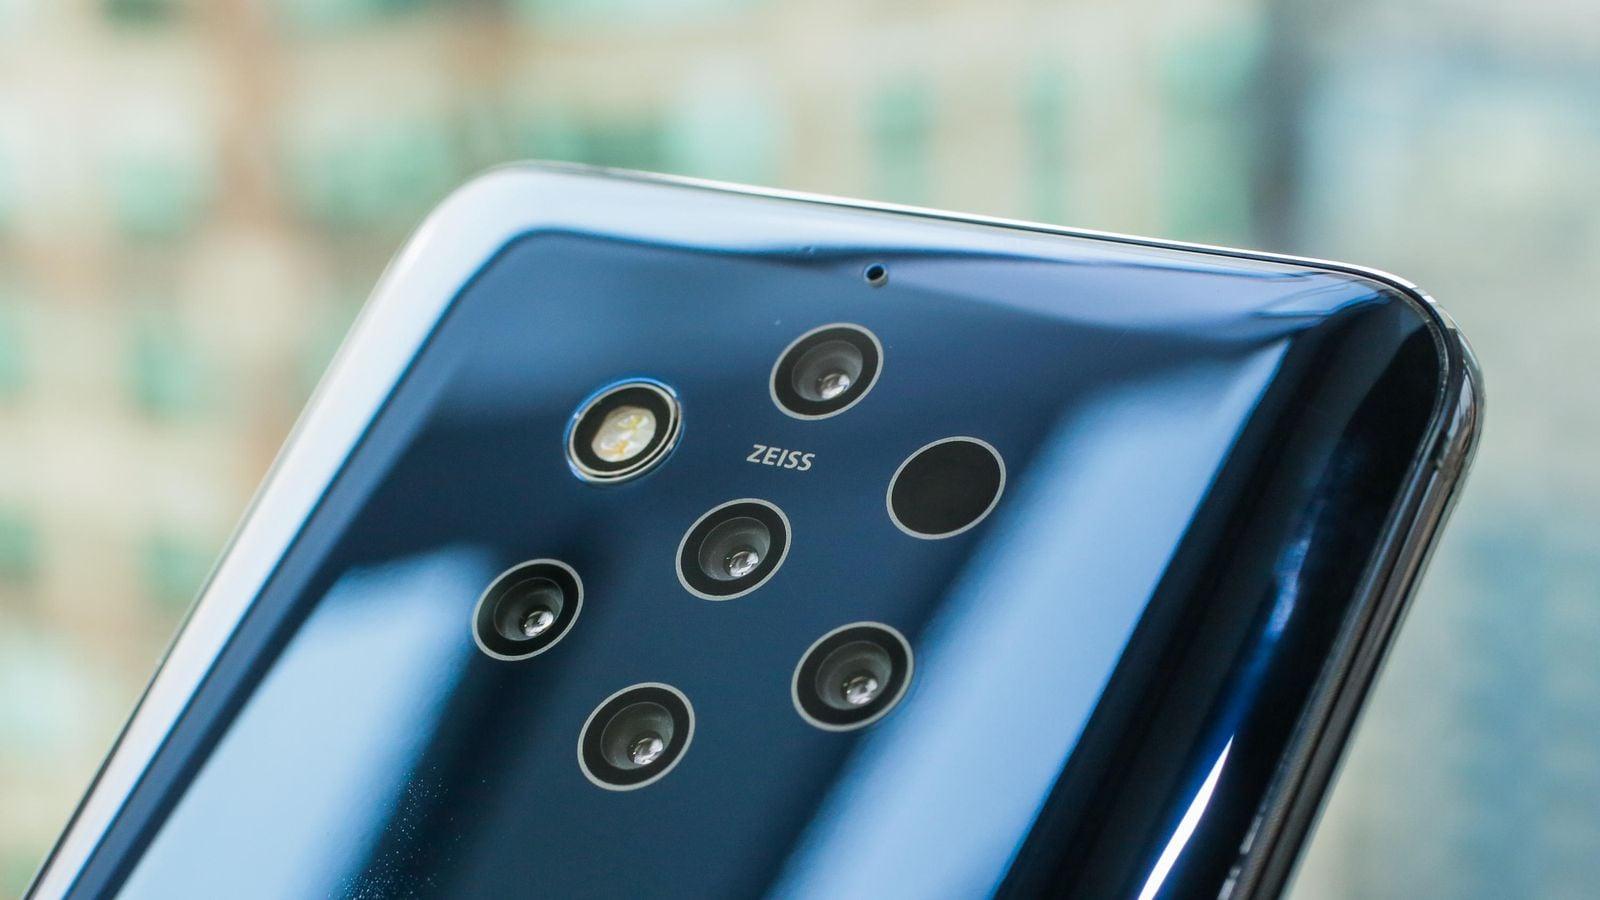 MWC Day 2: Smartphones για όλα τα γούστα με φόντο την εποχή του 5G!